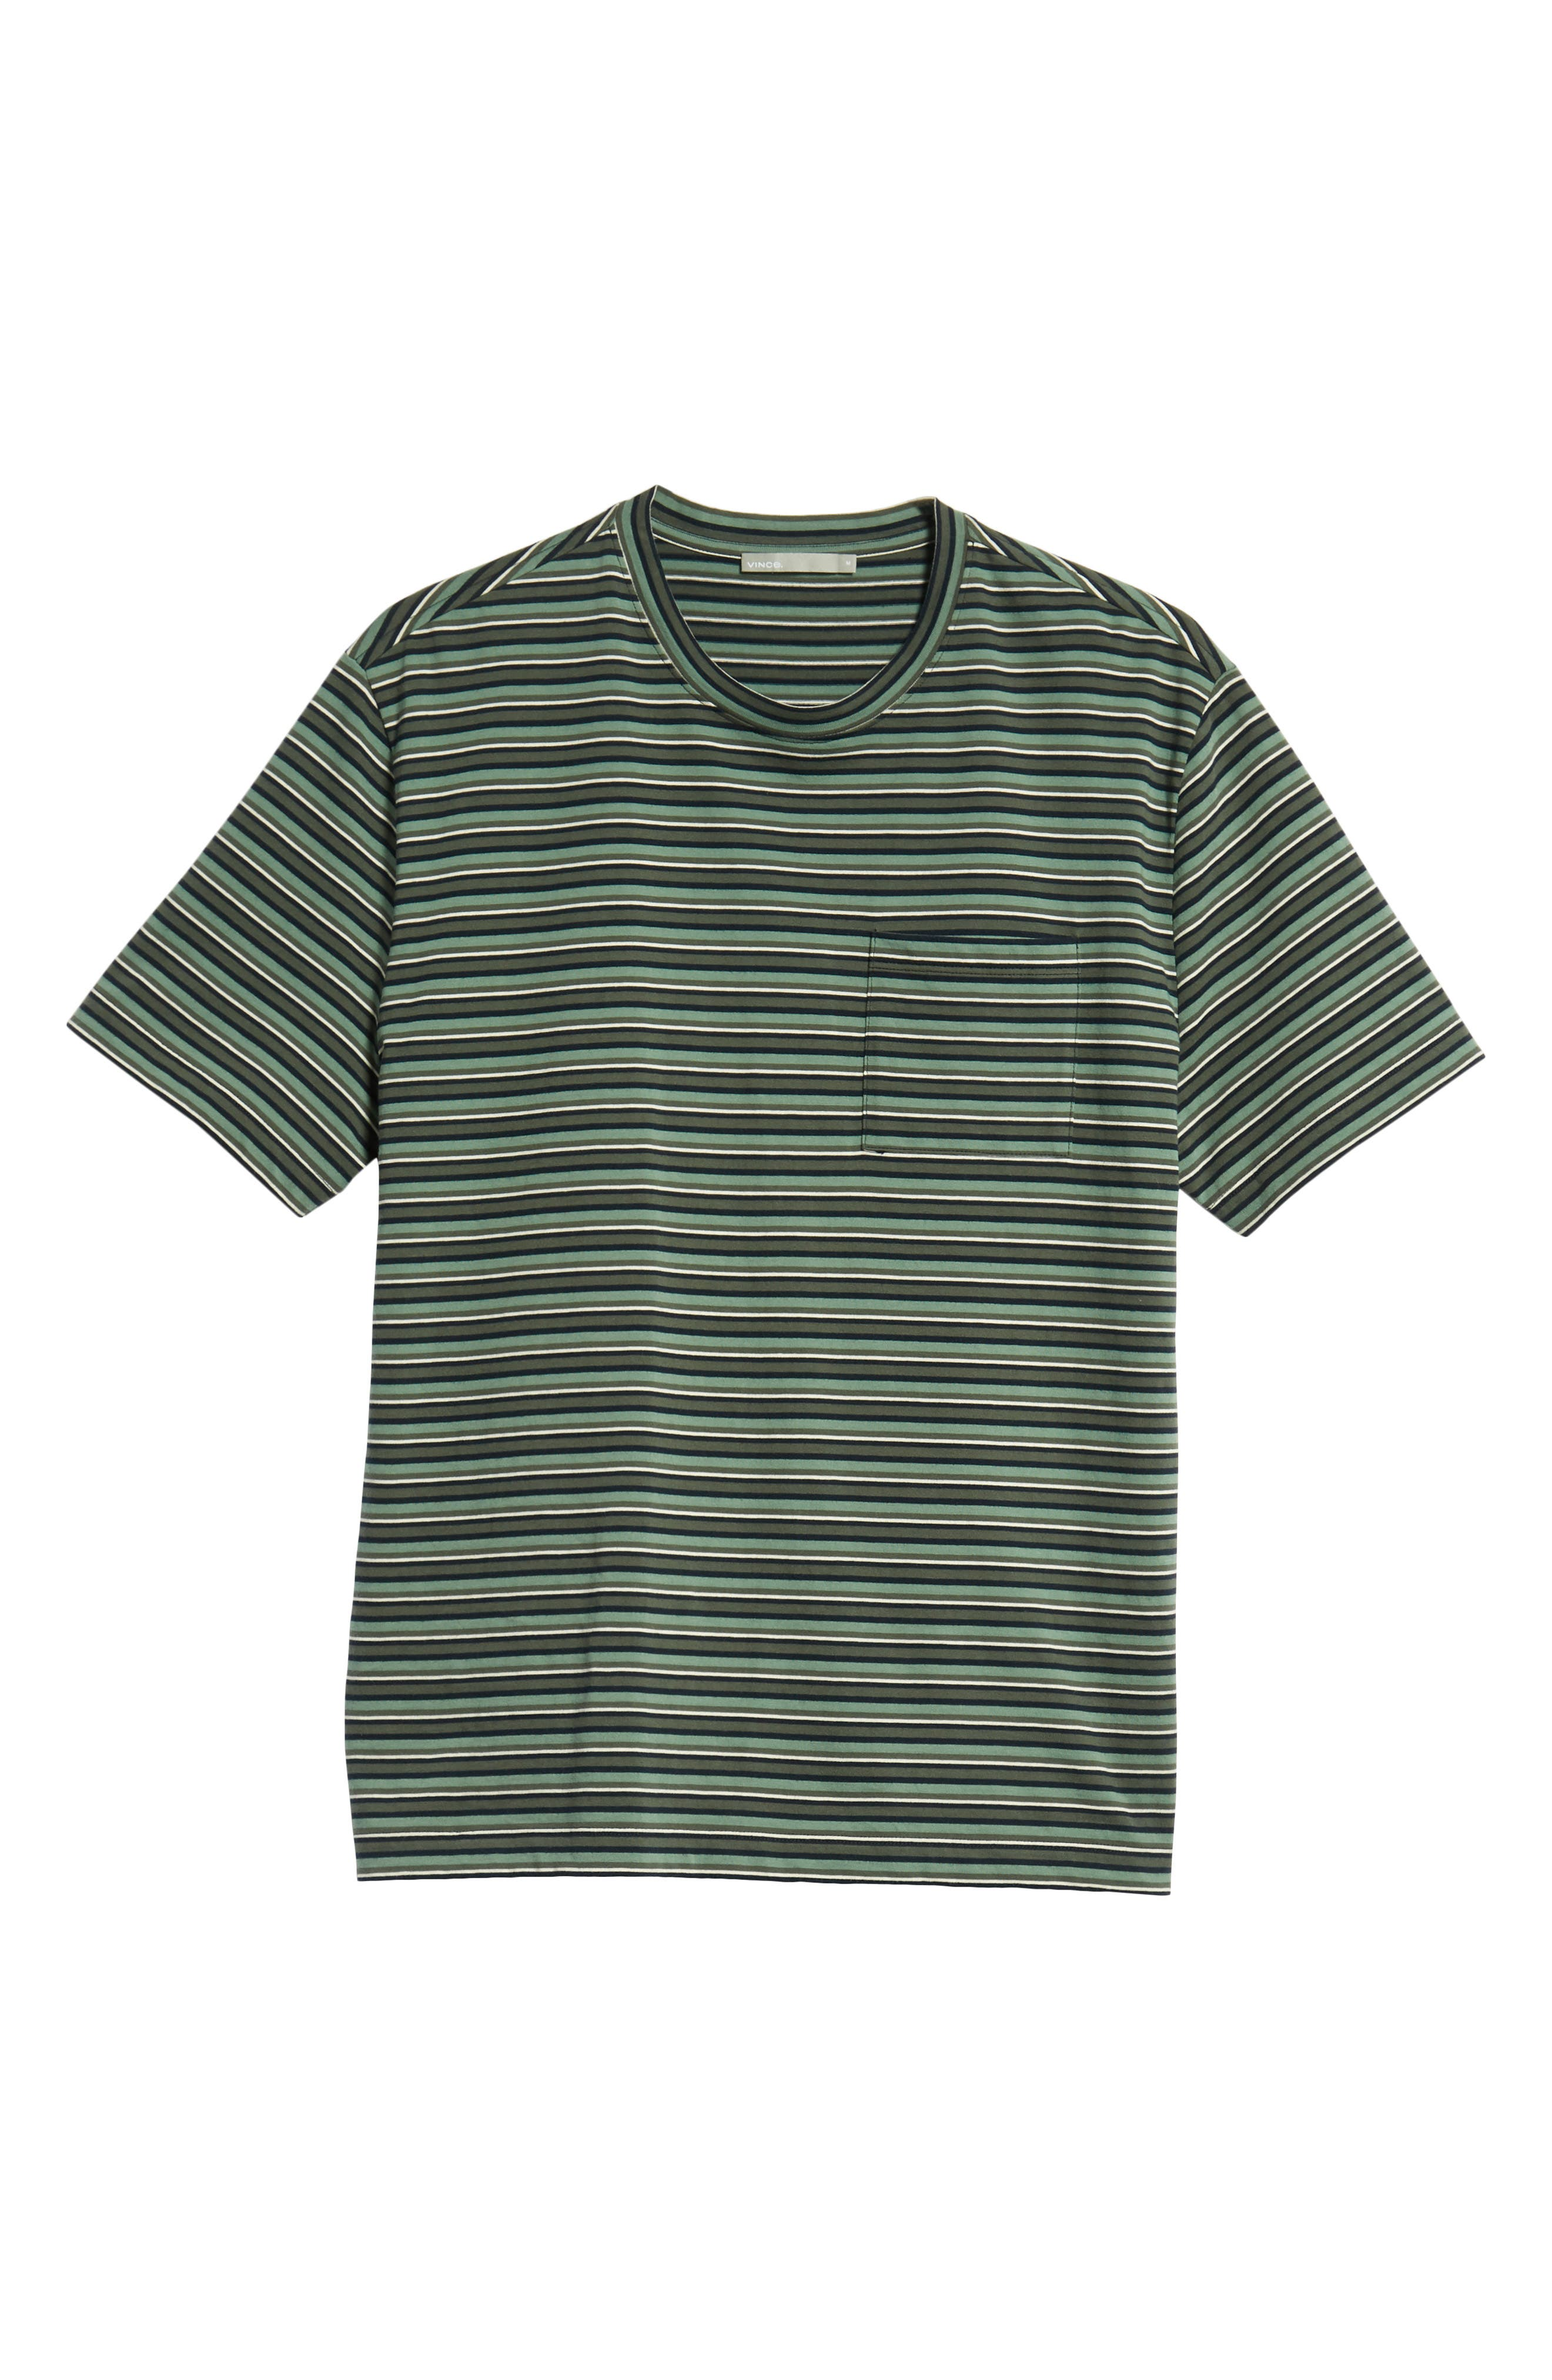 Regular Fit Multistripe Pocket T-Shirt,                             Alternate thumbnail 6, color,                             URBAN GREEN/ SPEARMINT